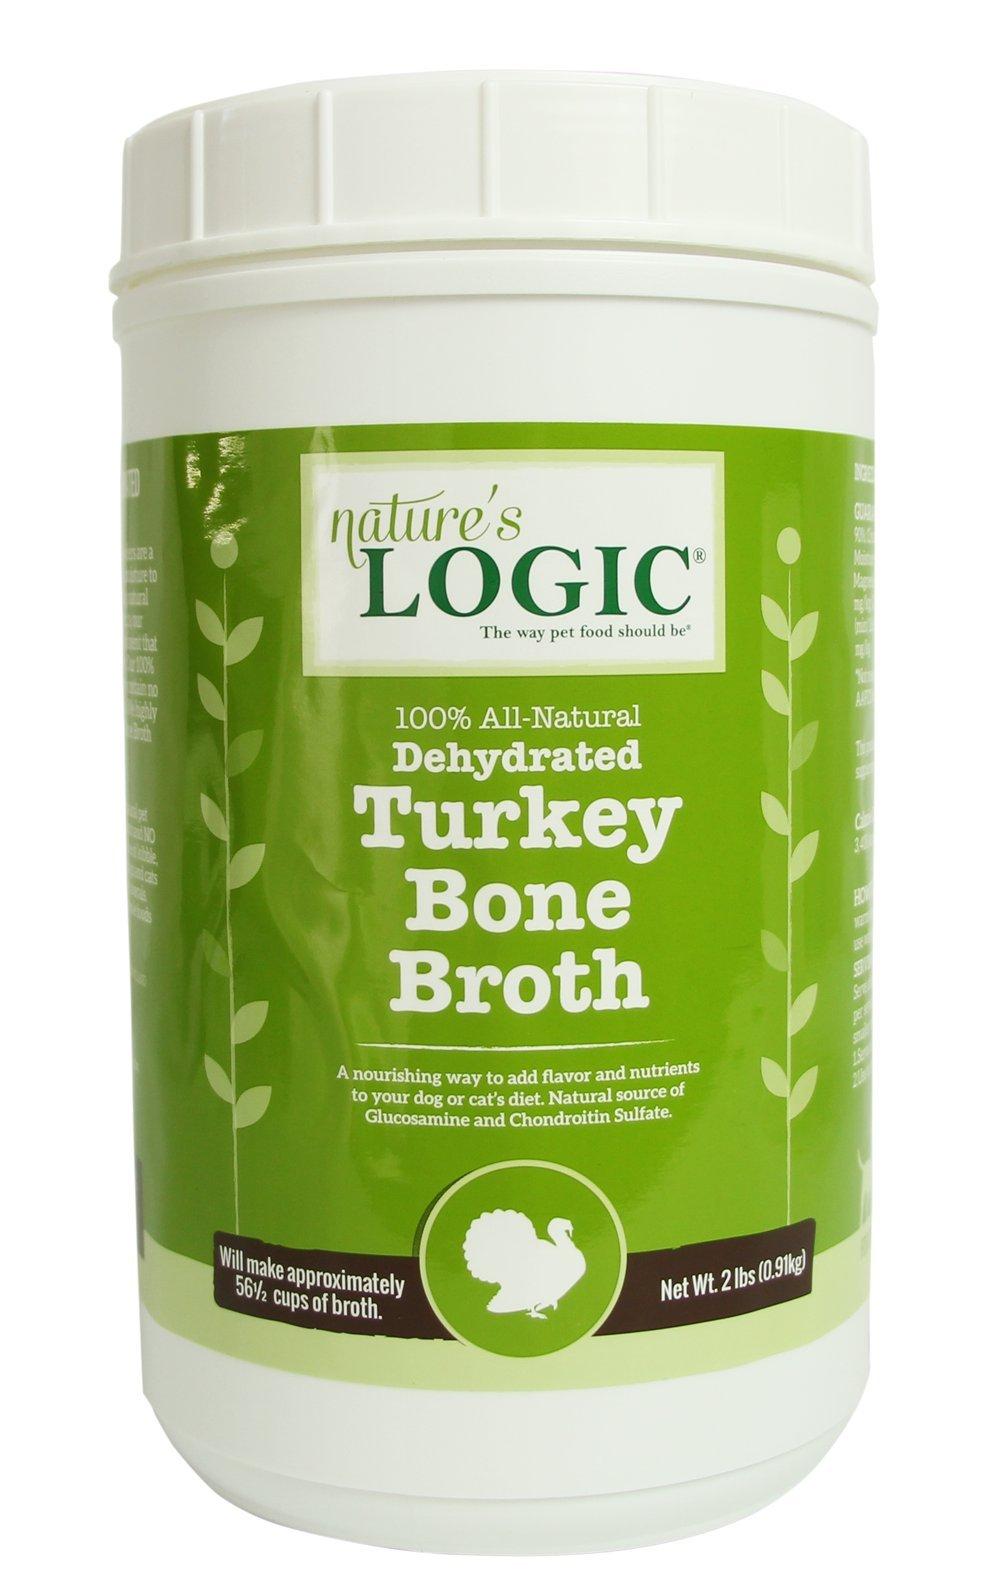 Nature'S Logic Dehydrated Turkey Bone Broth, 2Lb by NATURE'S LOGIC